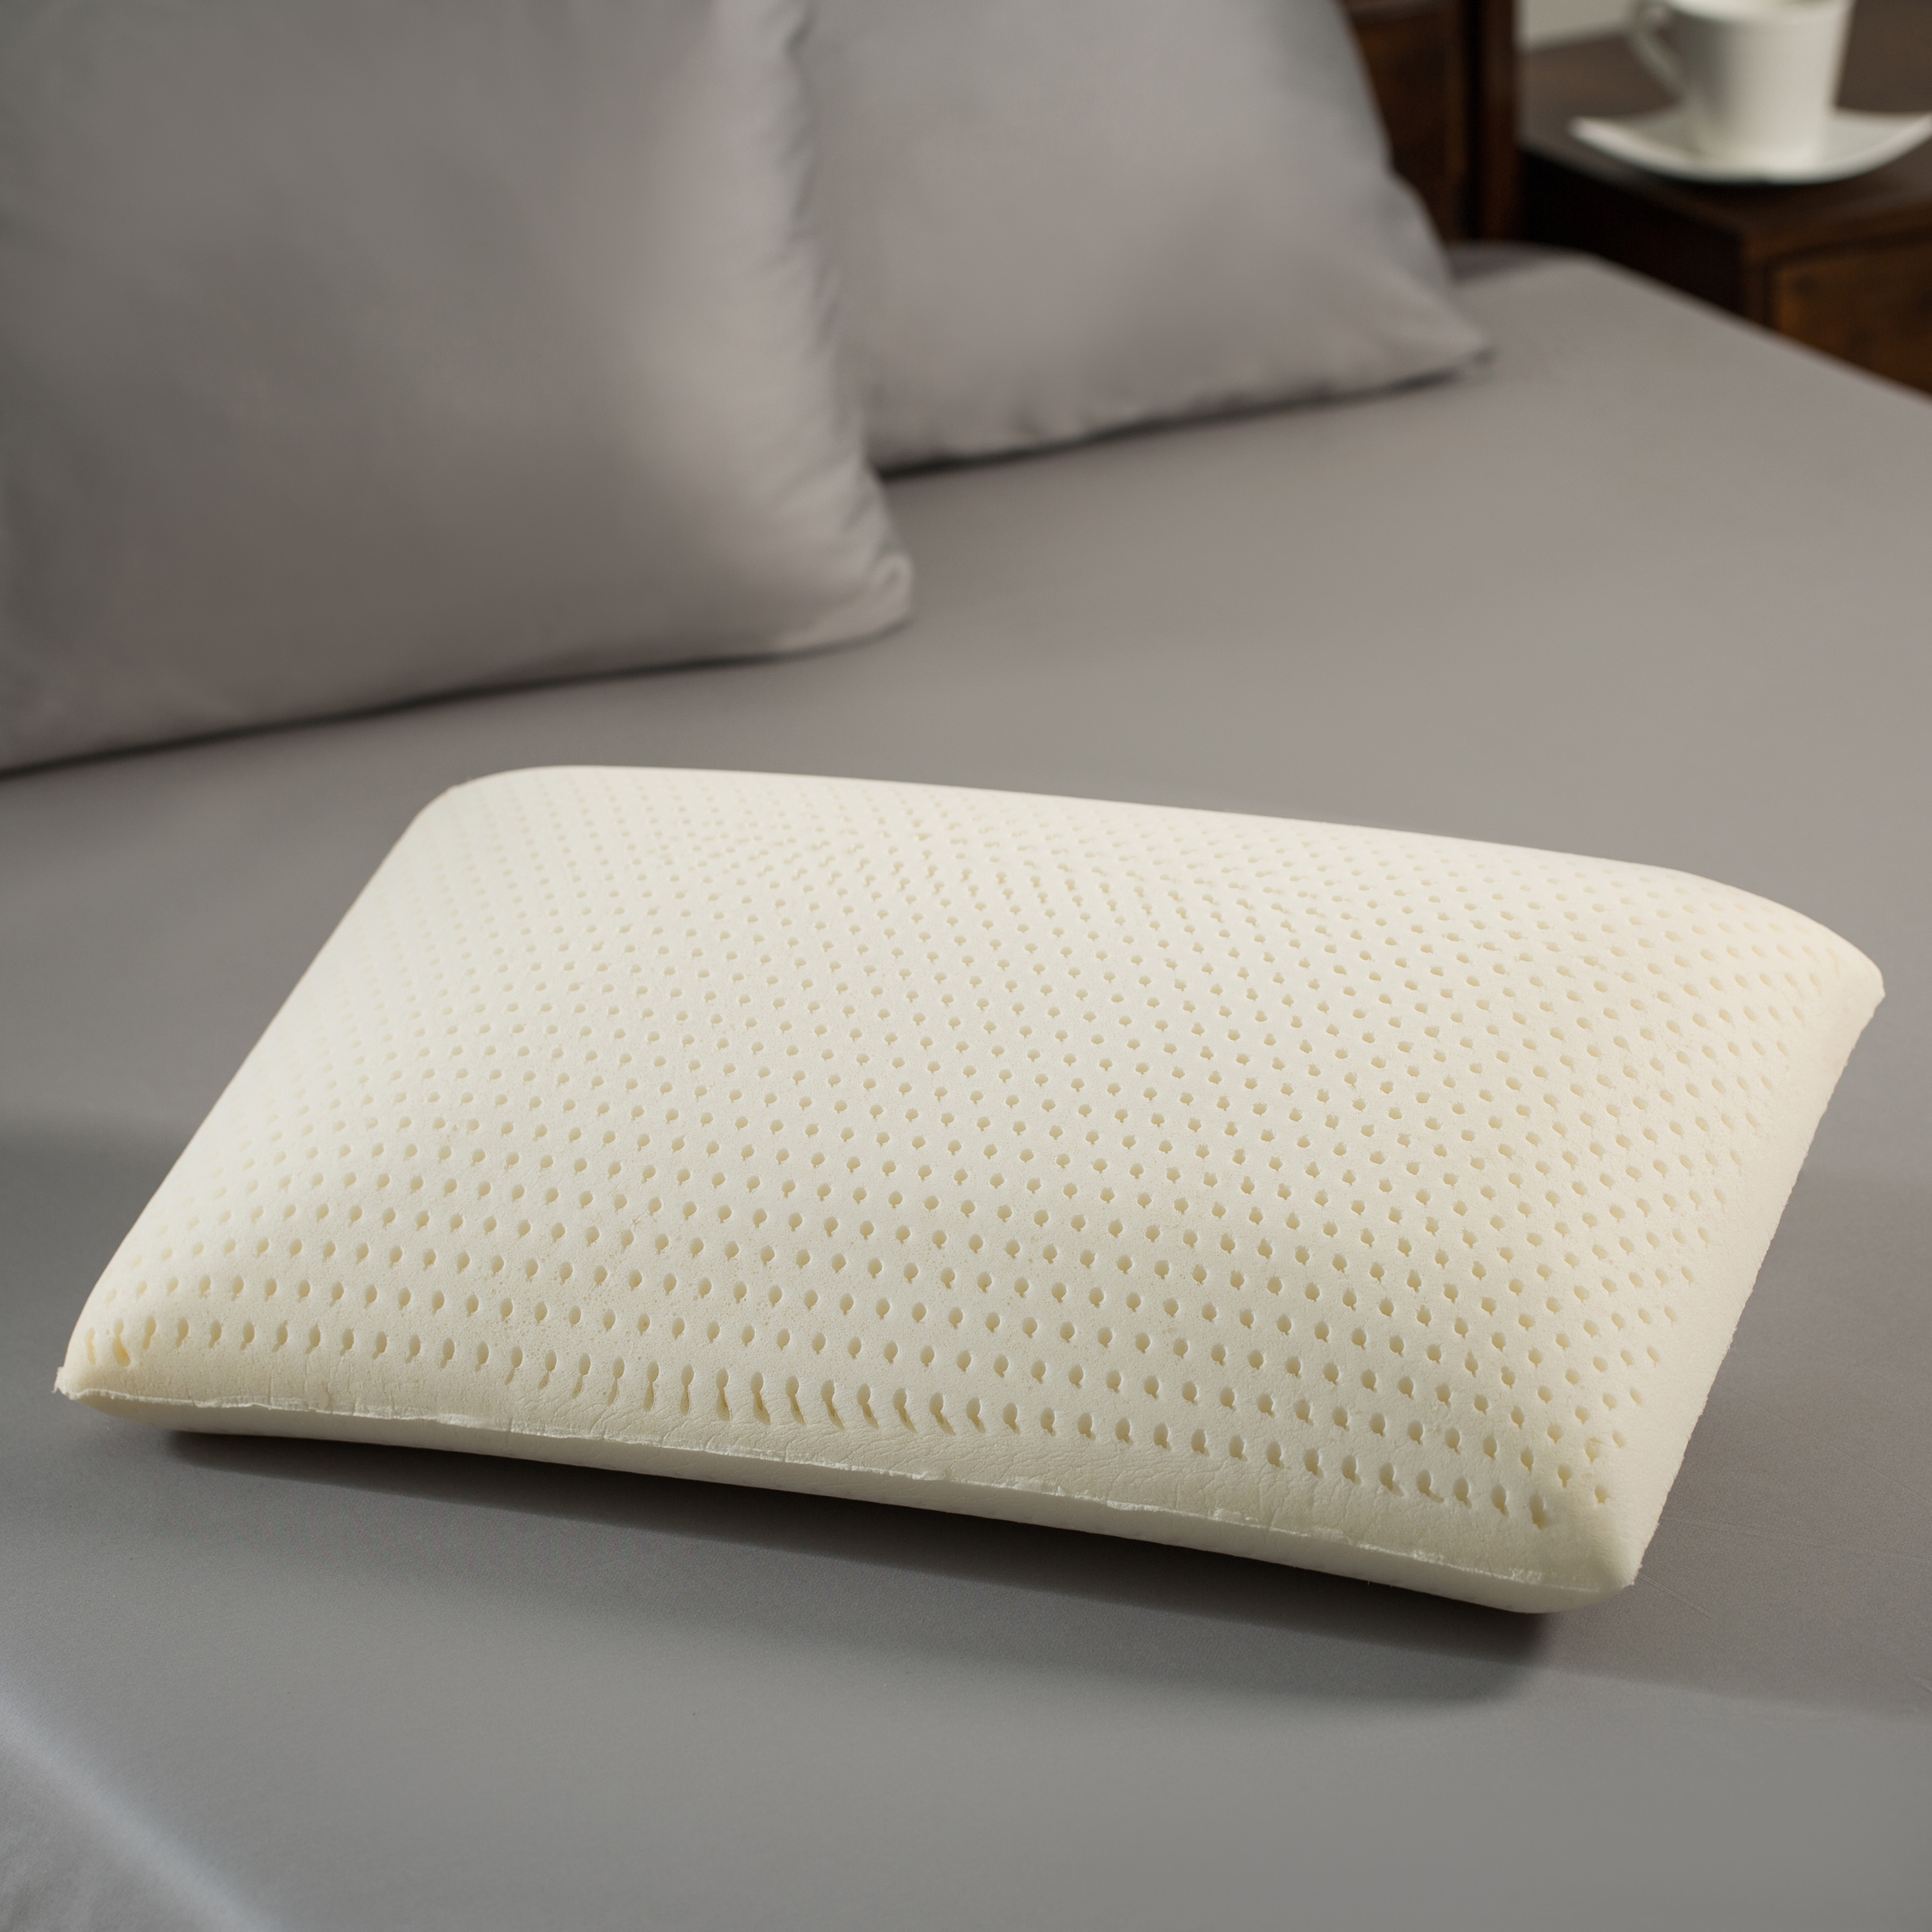 Shop Premium Natural Latex Foam Pillow On Sale Overstock 83870